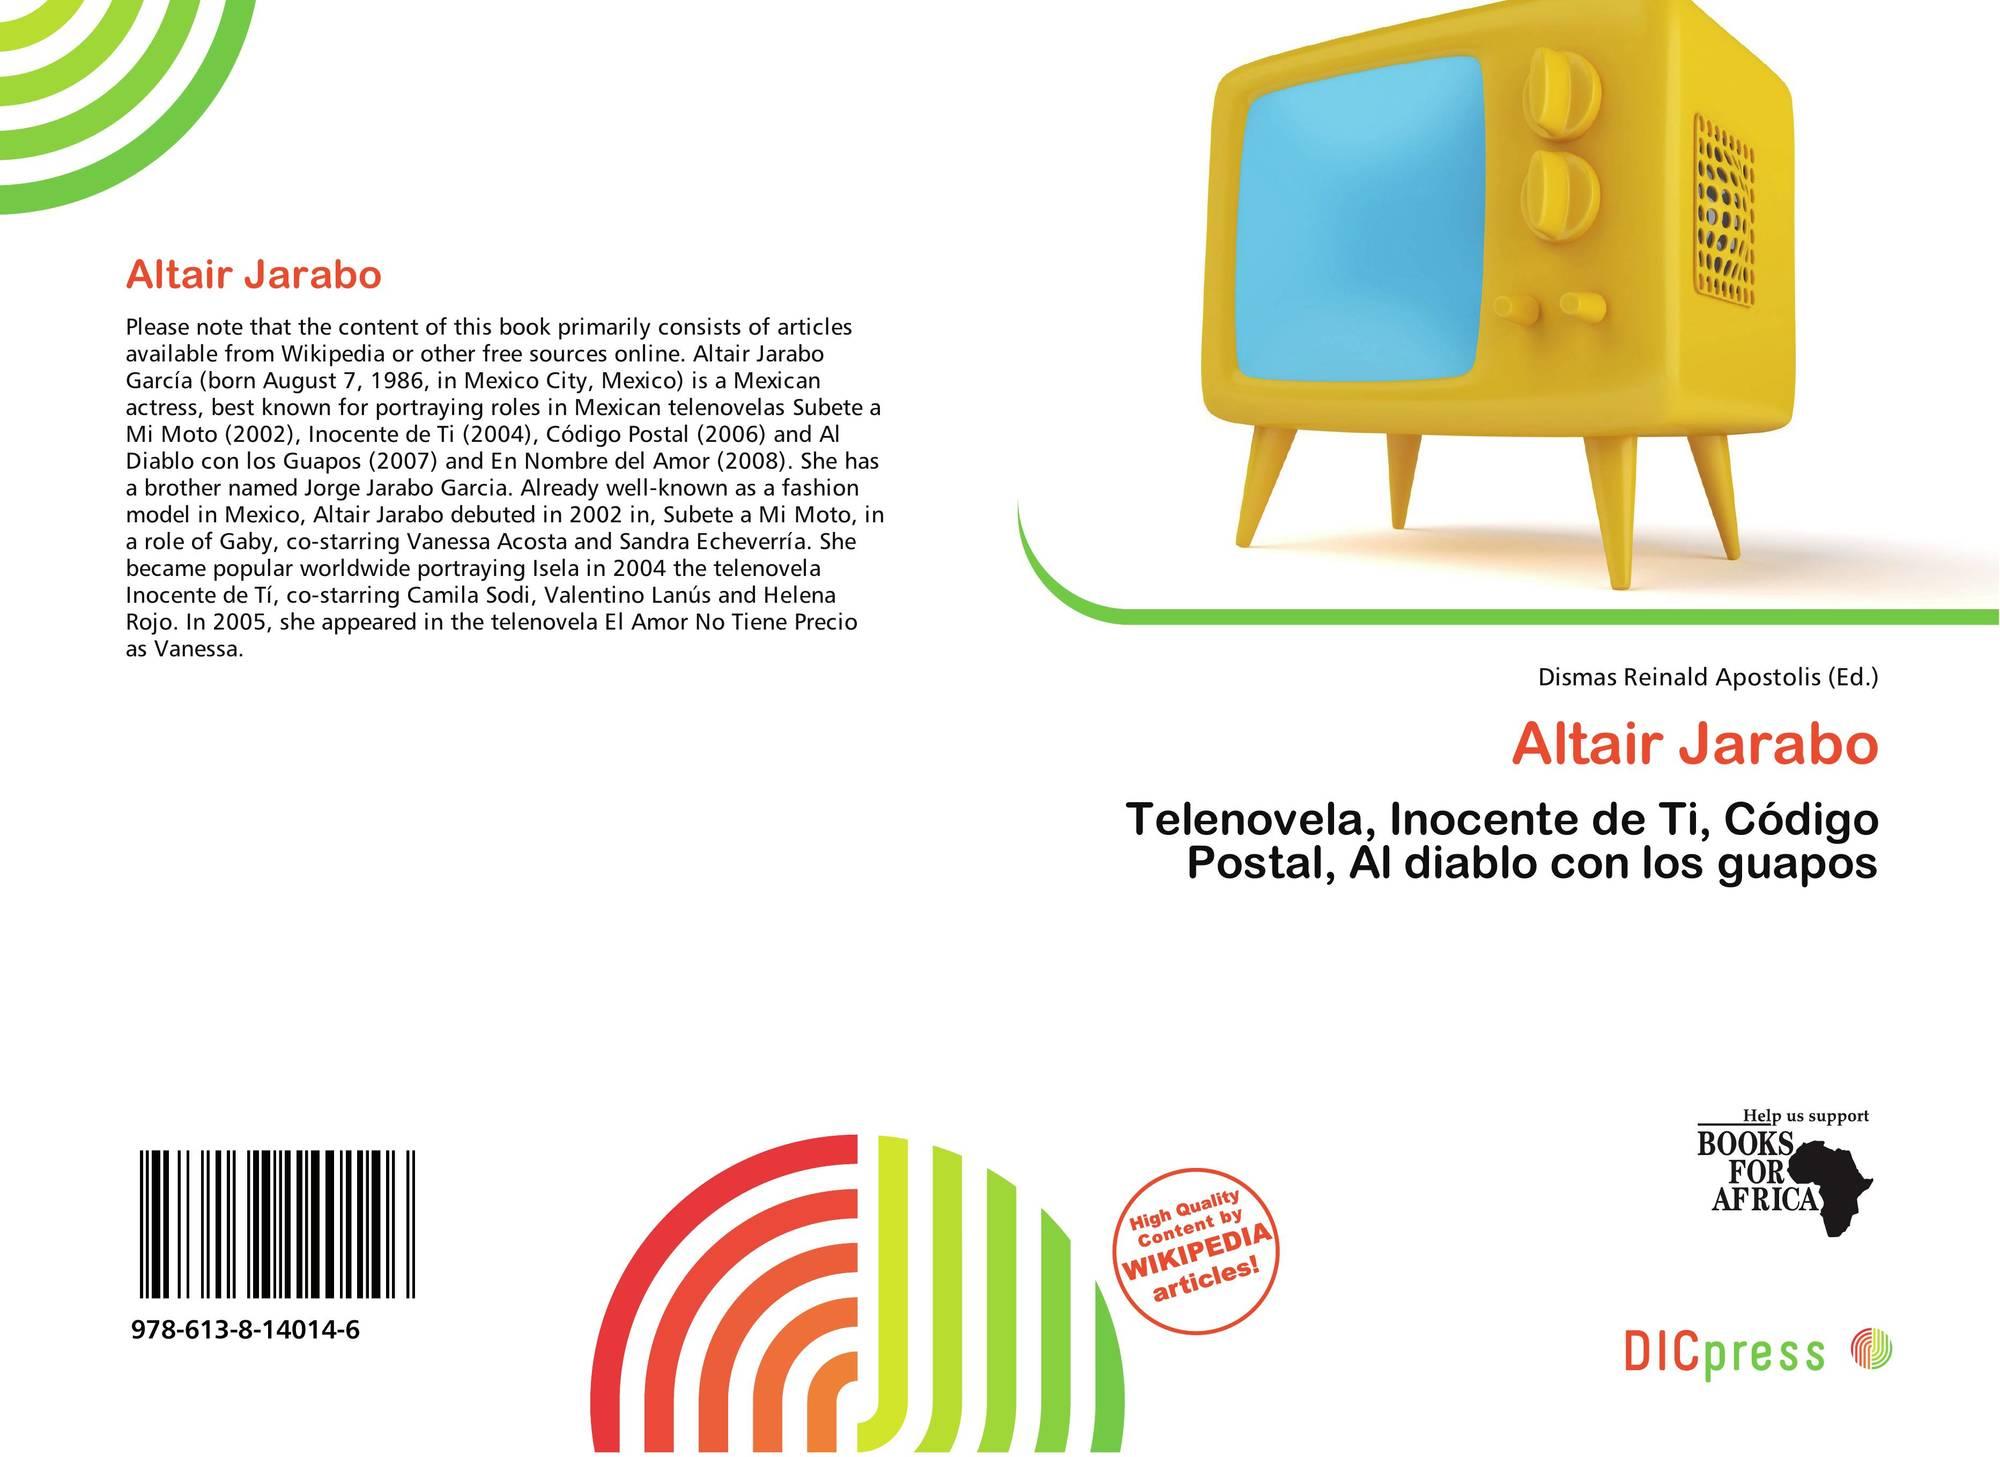 Altair Jarabo Wikipedia altair jarabo, 978-613-8-14014-6, 6138140141 ,9786138140146